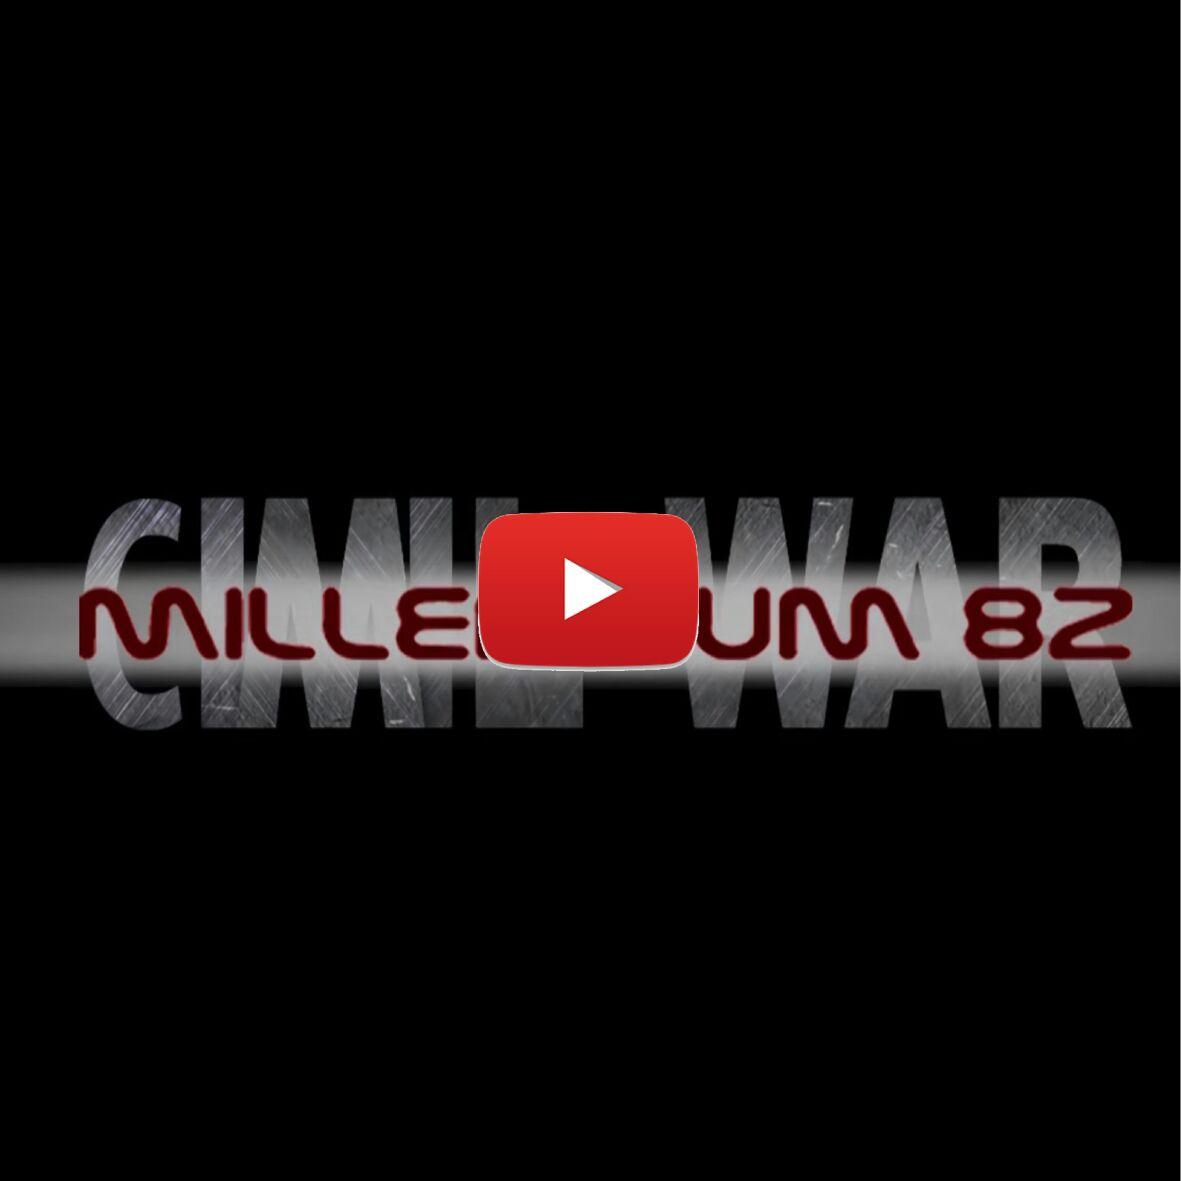 Cimil War Trailer Parody